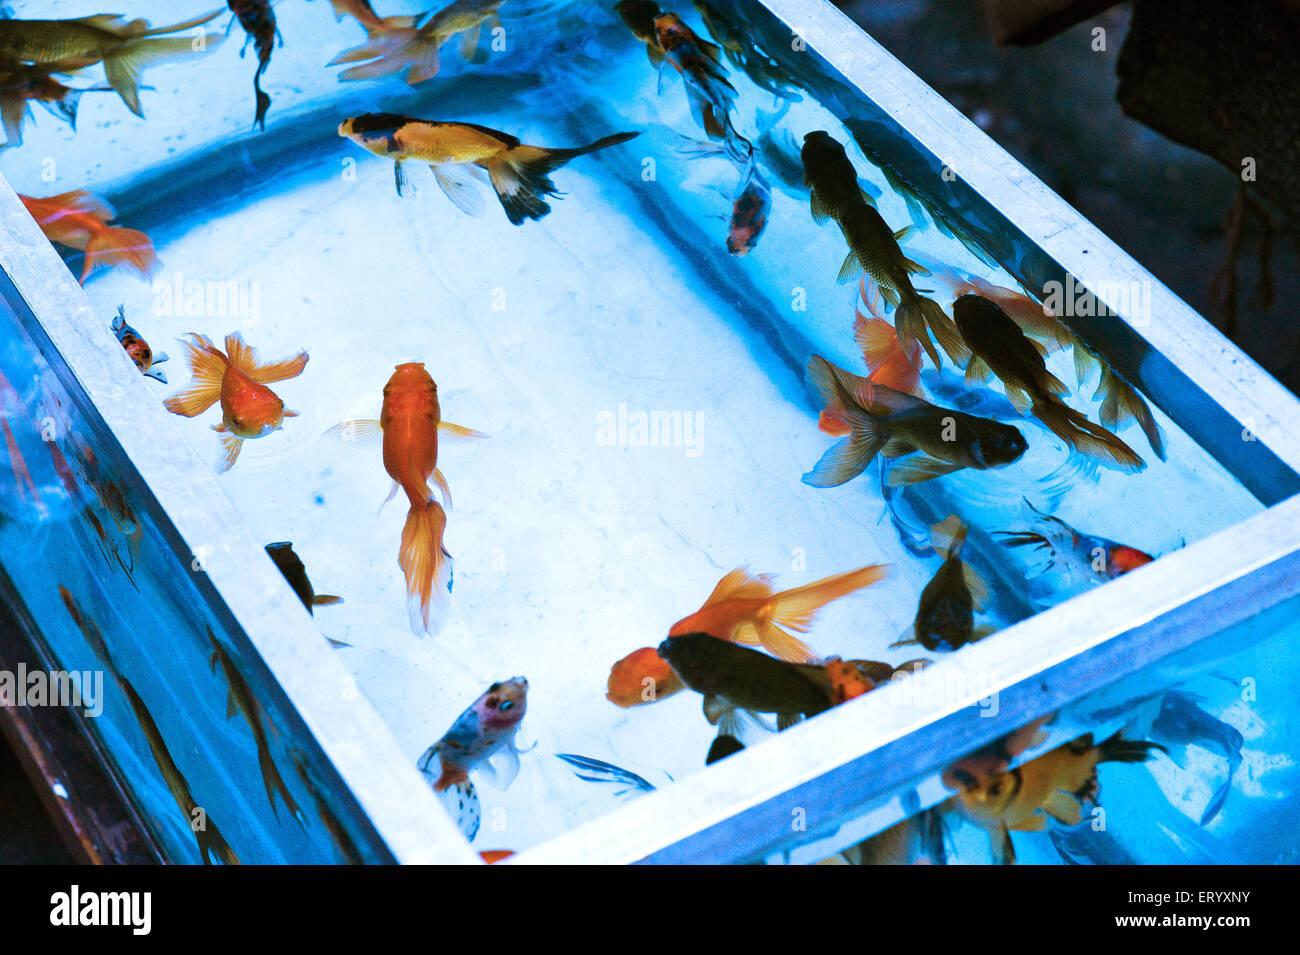 Fish for aquarium in kolkata - Aquarium Fishes Japanese Gold Fish Calcutta Kolkata West Bengal India